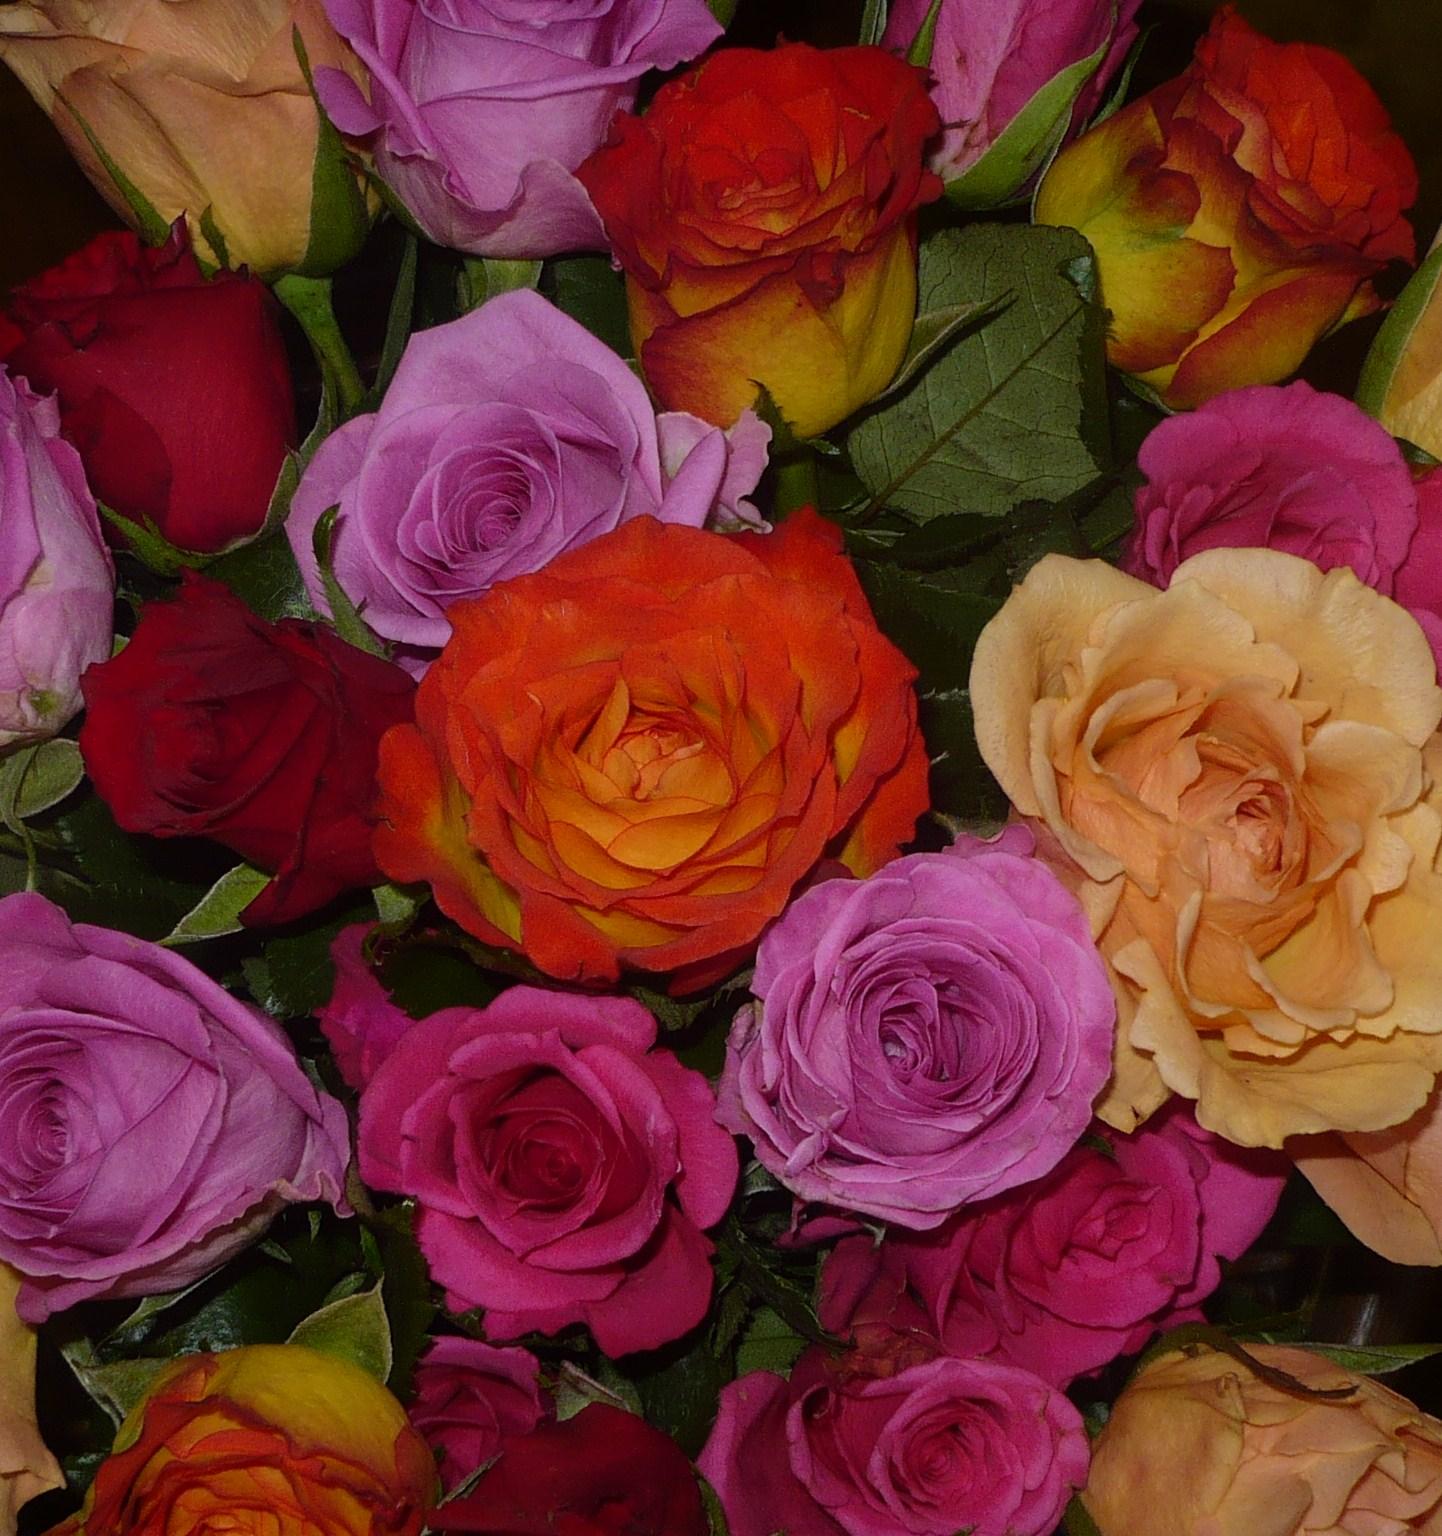 les-roses-de-la-fete-des-meres-004.JPG